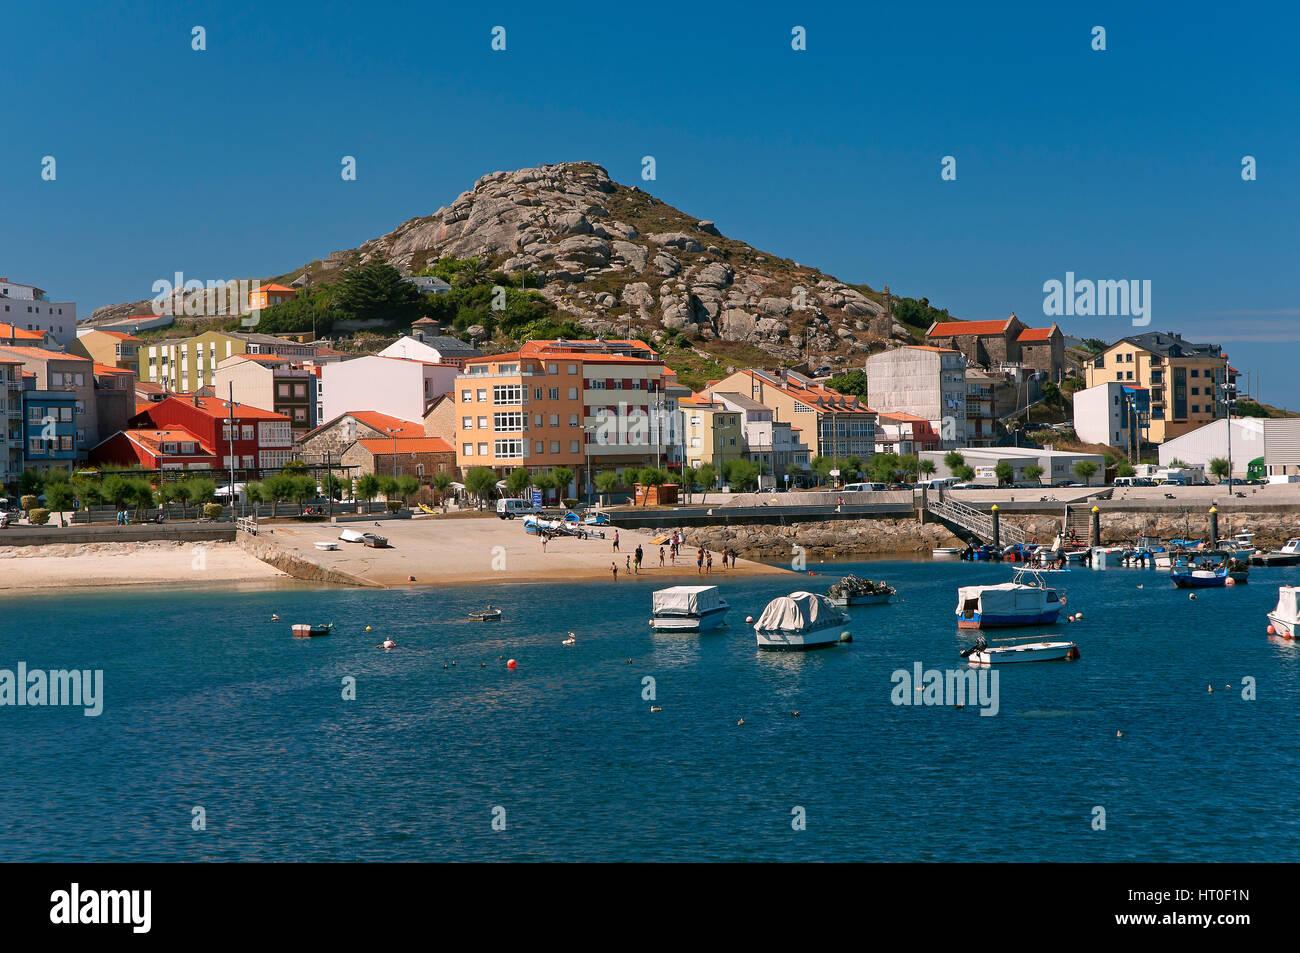 Coastal landscape, Muxia, La Coruña province, Region of Galicia, Spain, Europe - Stock Image